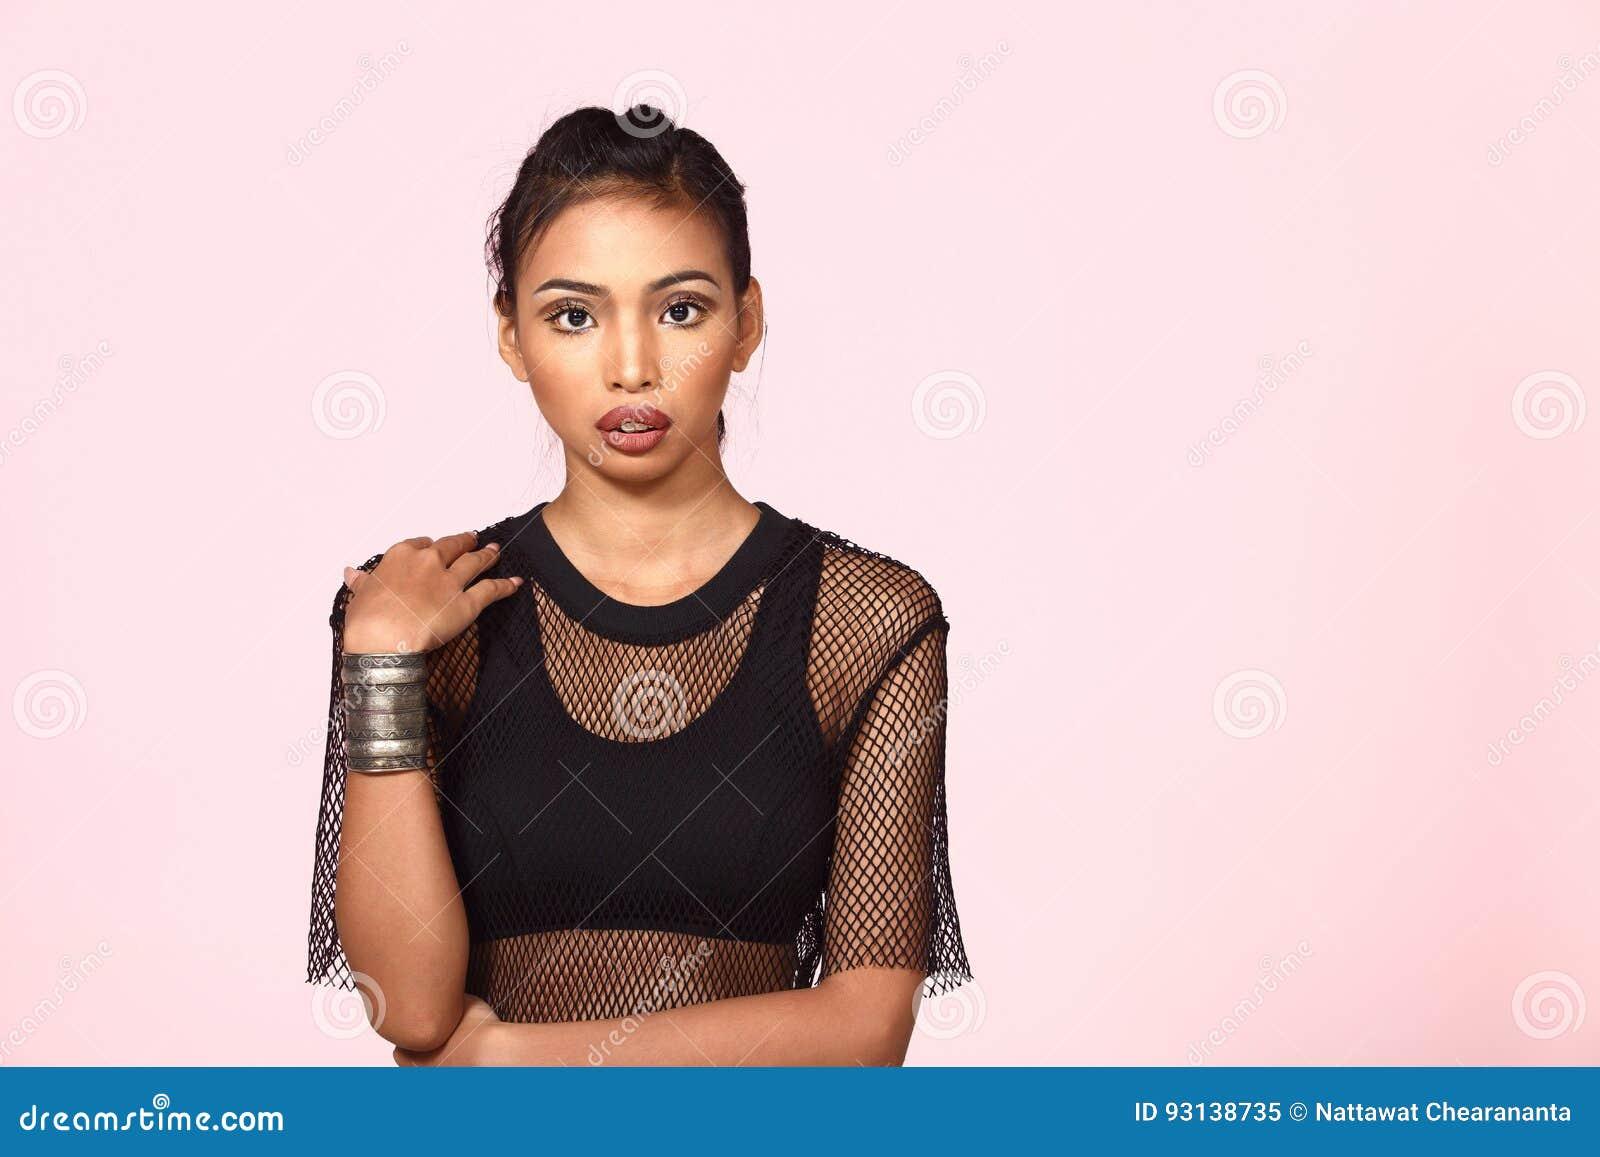 aecfaaba07197 Tan Skin Asian Woman In Sport Bra